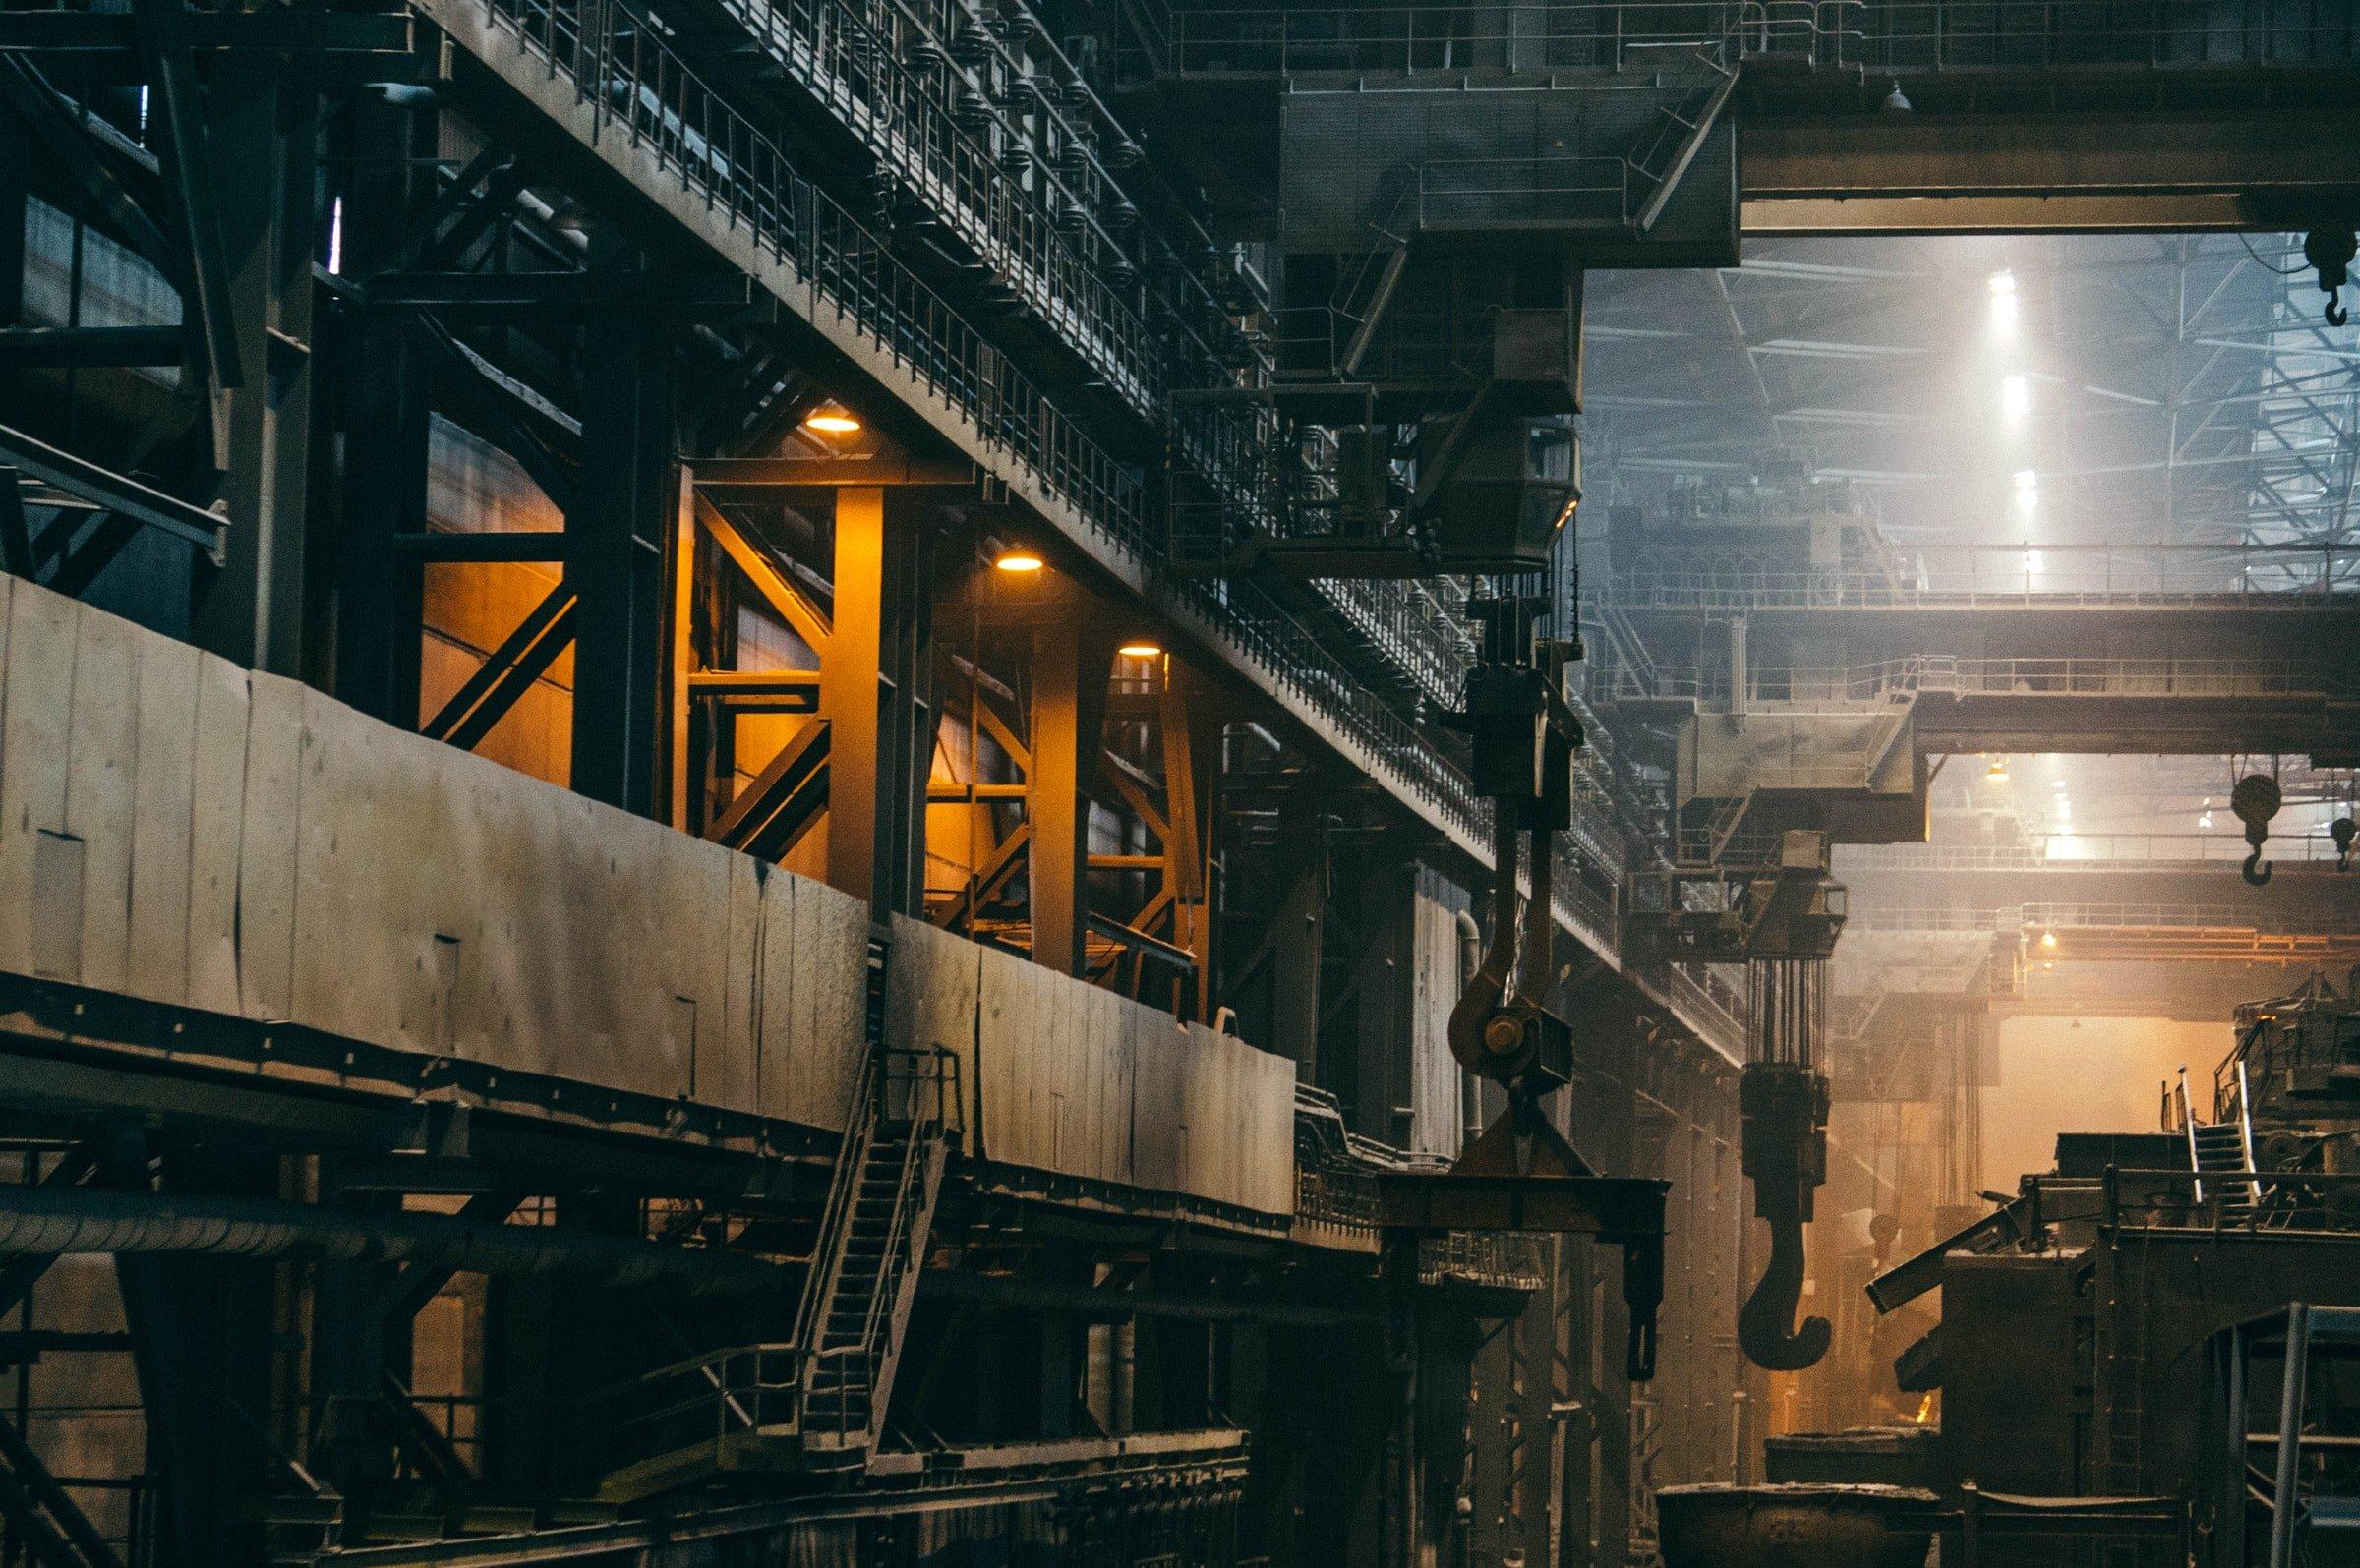 d-Hero-Manufacturing-Photo by Ant Rozetsky on Unsplash